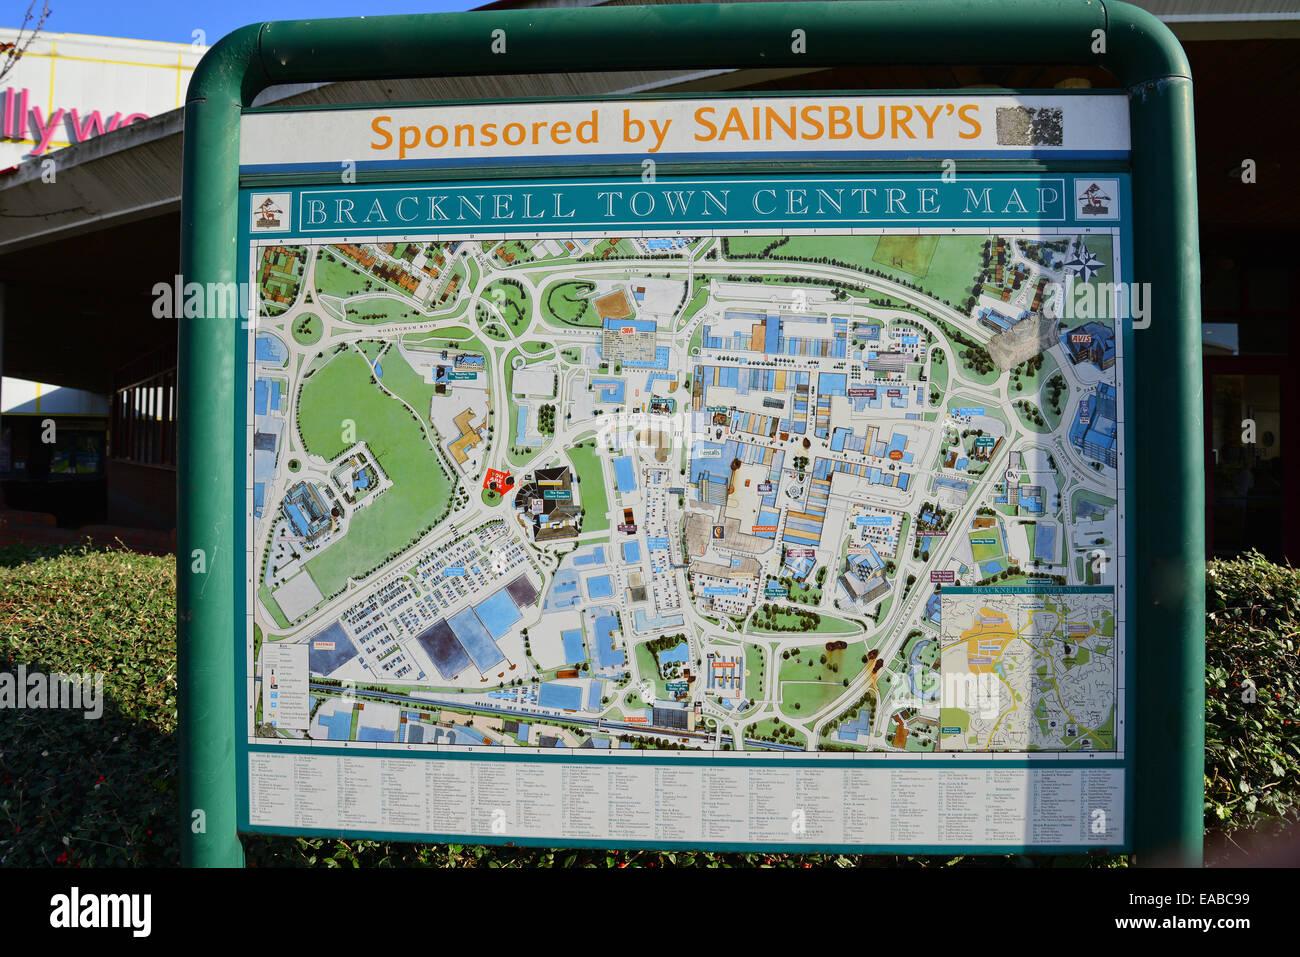 Bracknell town centre map, Skimped Hill Lane, Bracknell, Berkshire, England, United Kingdom - Stock Image